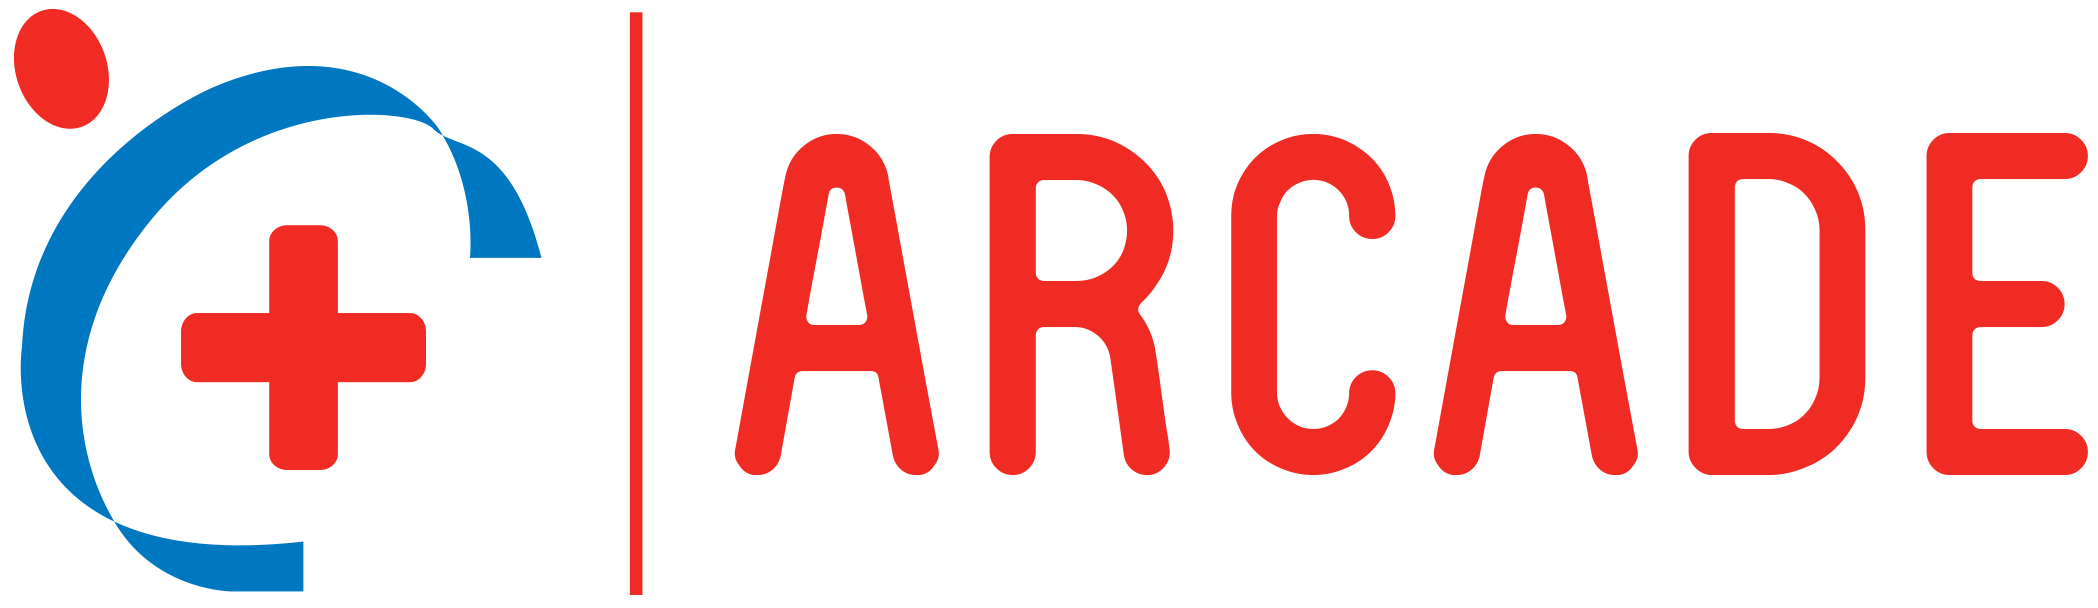 logo_PoliambulatoriArcade